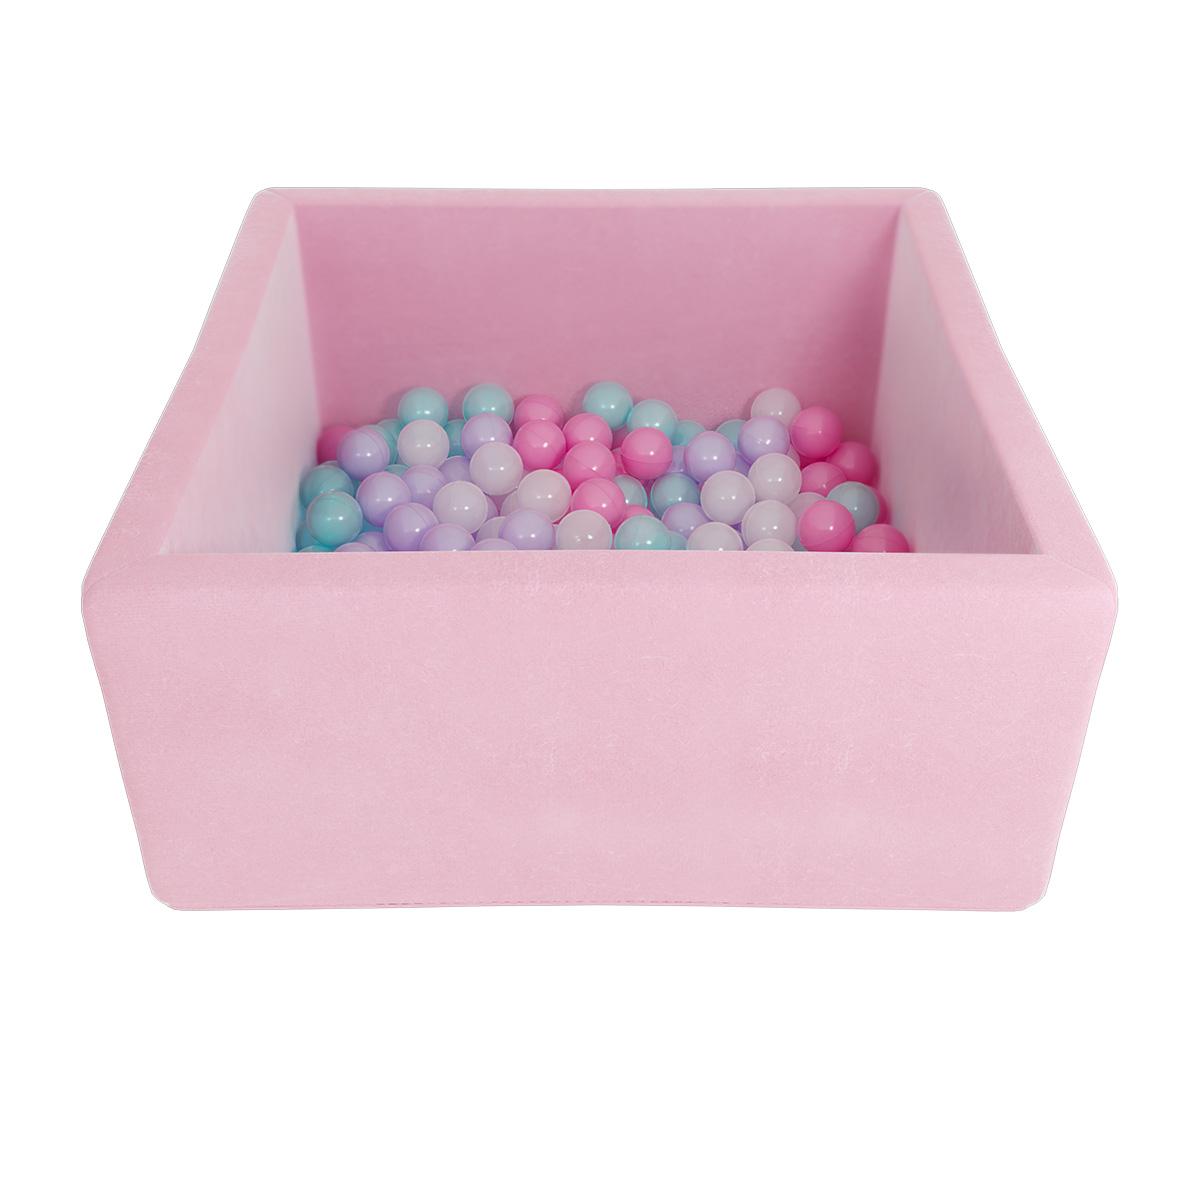 Купить Детский сухой бассейн Romana Airpool Box, розовый, без шариков, Romana (Романа)